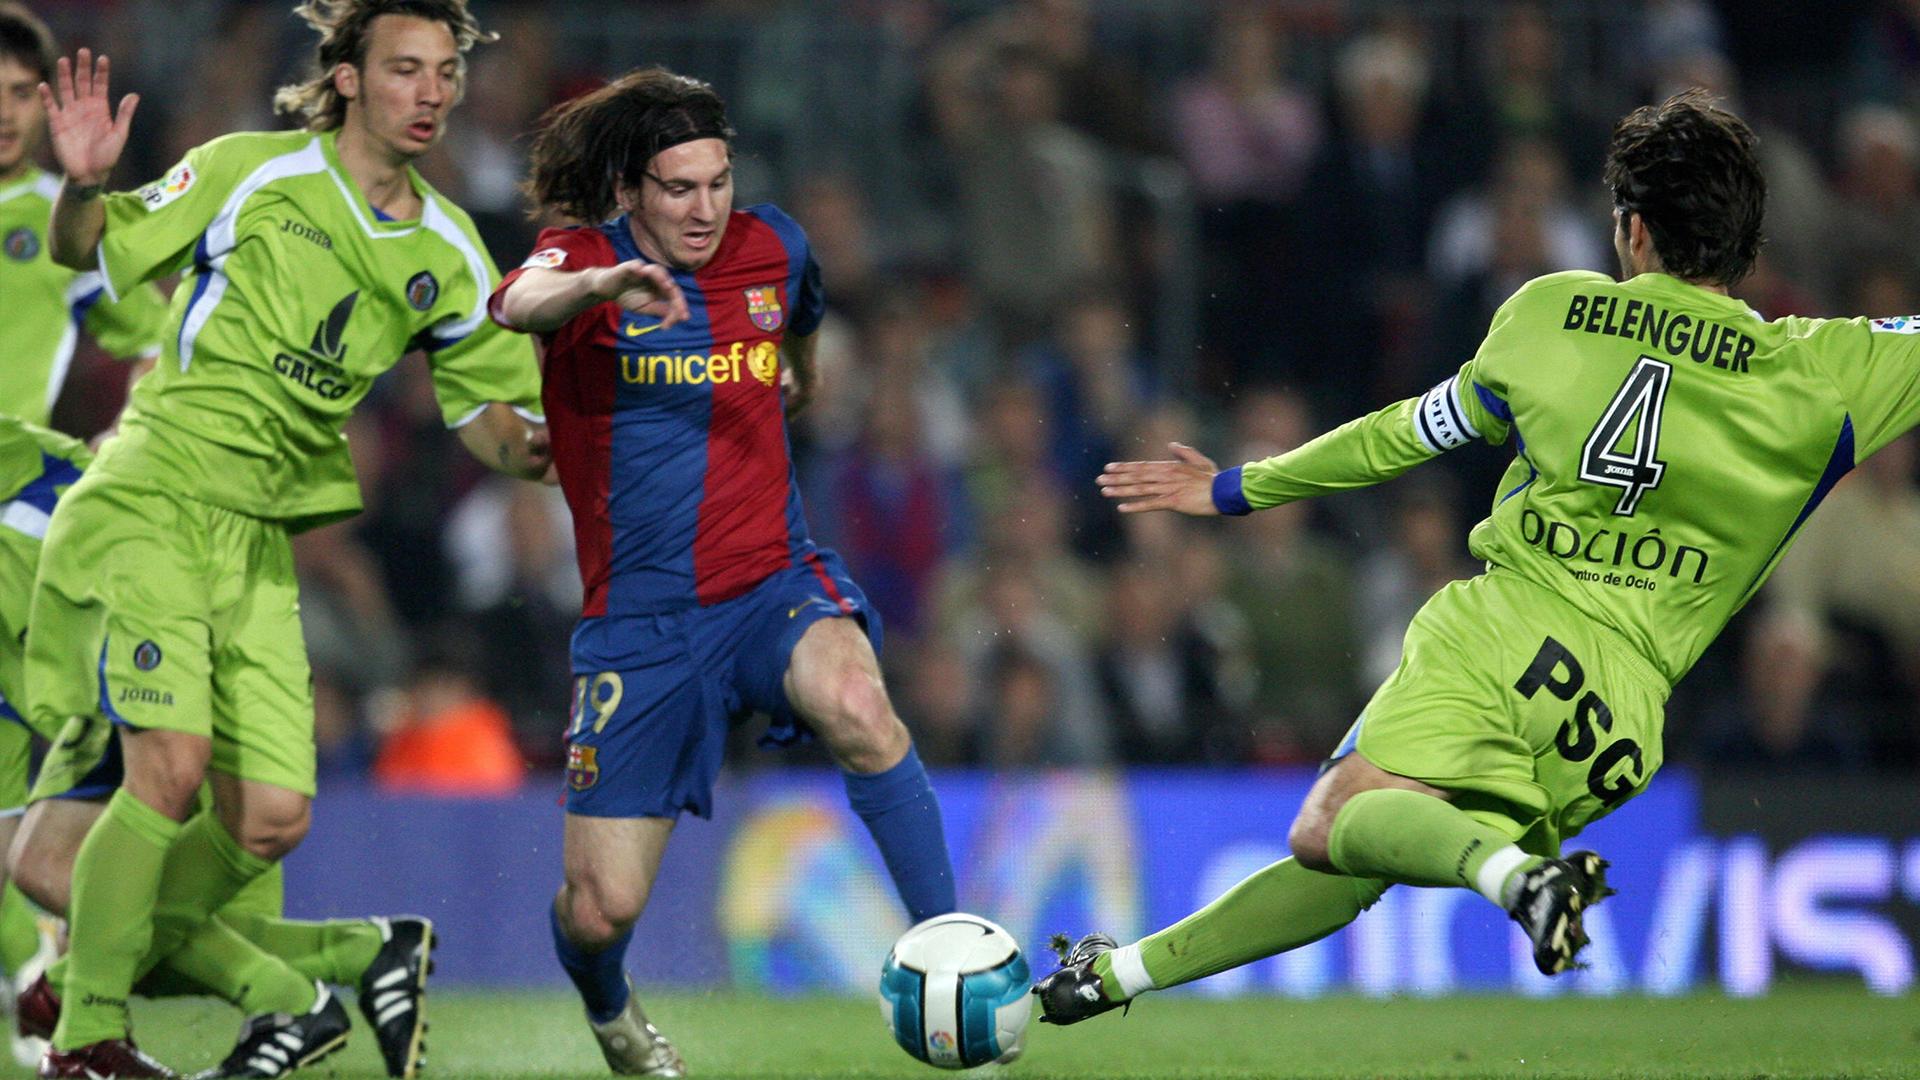 Messi on a run against Getafe